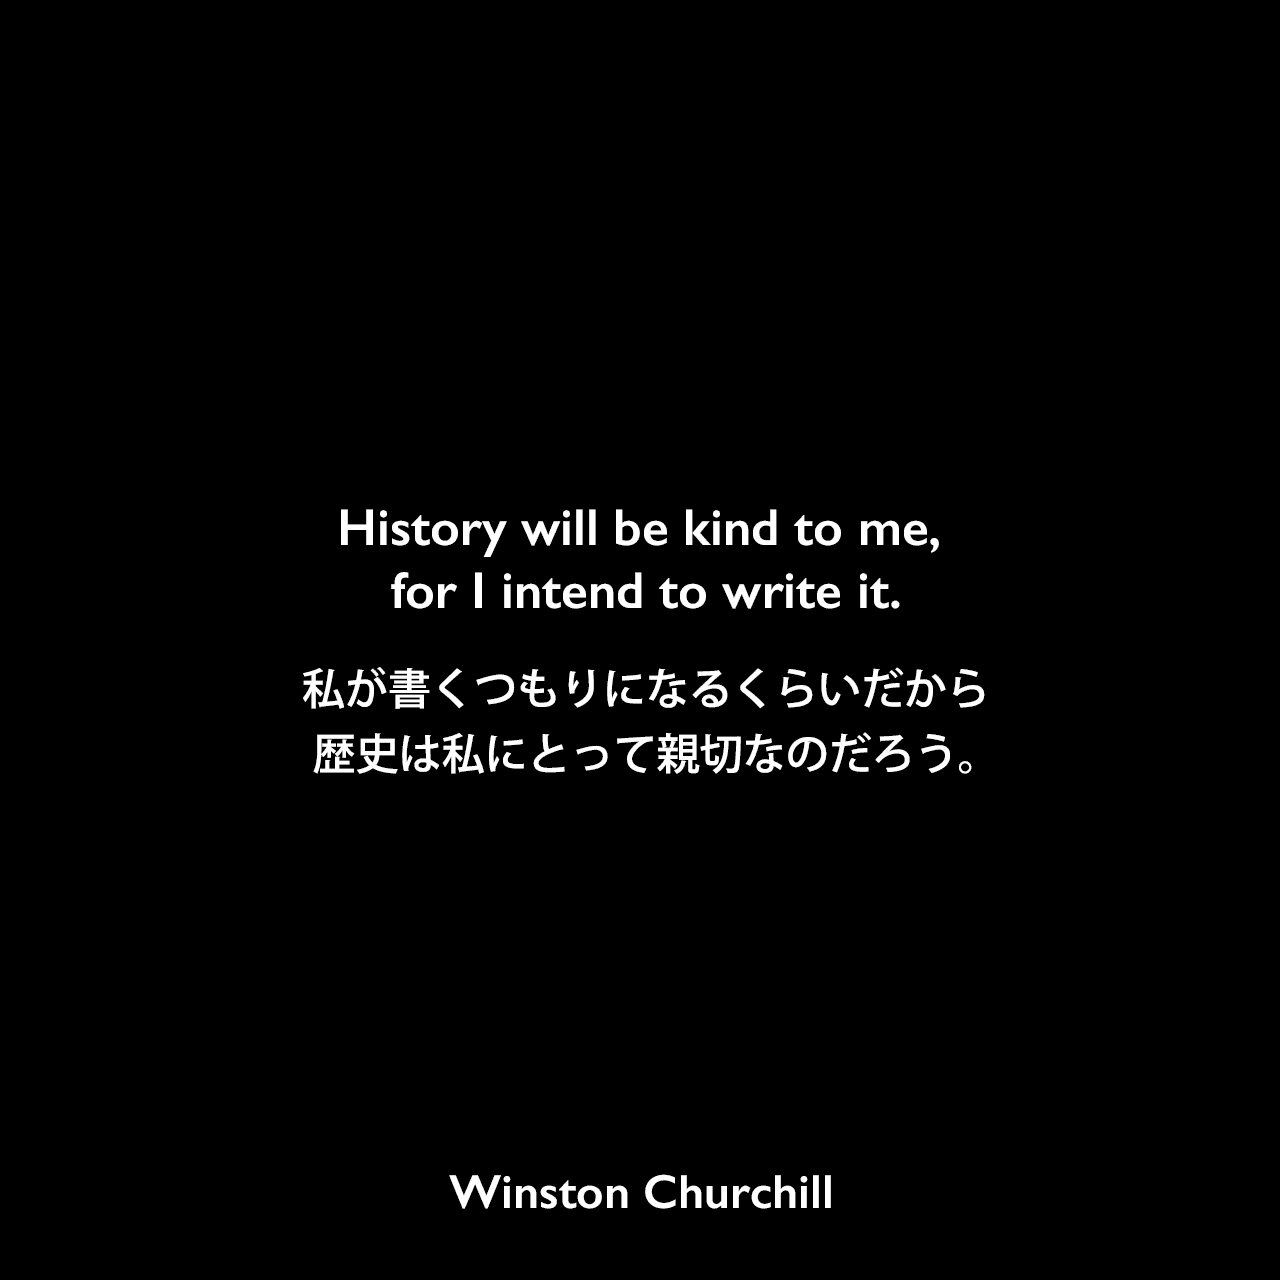 History will be kind to me, for I intend to write it.私が書くつもりになるくらいだから、歴史は私にとって親切なのだろう。- 1948年、イギリス庶民院でのスピーチよりWinston Churchill